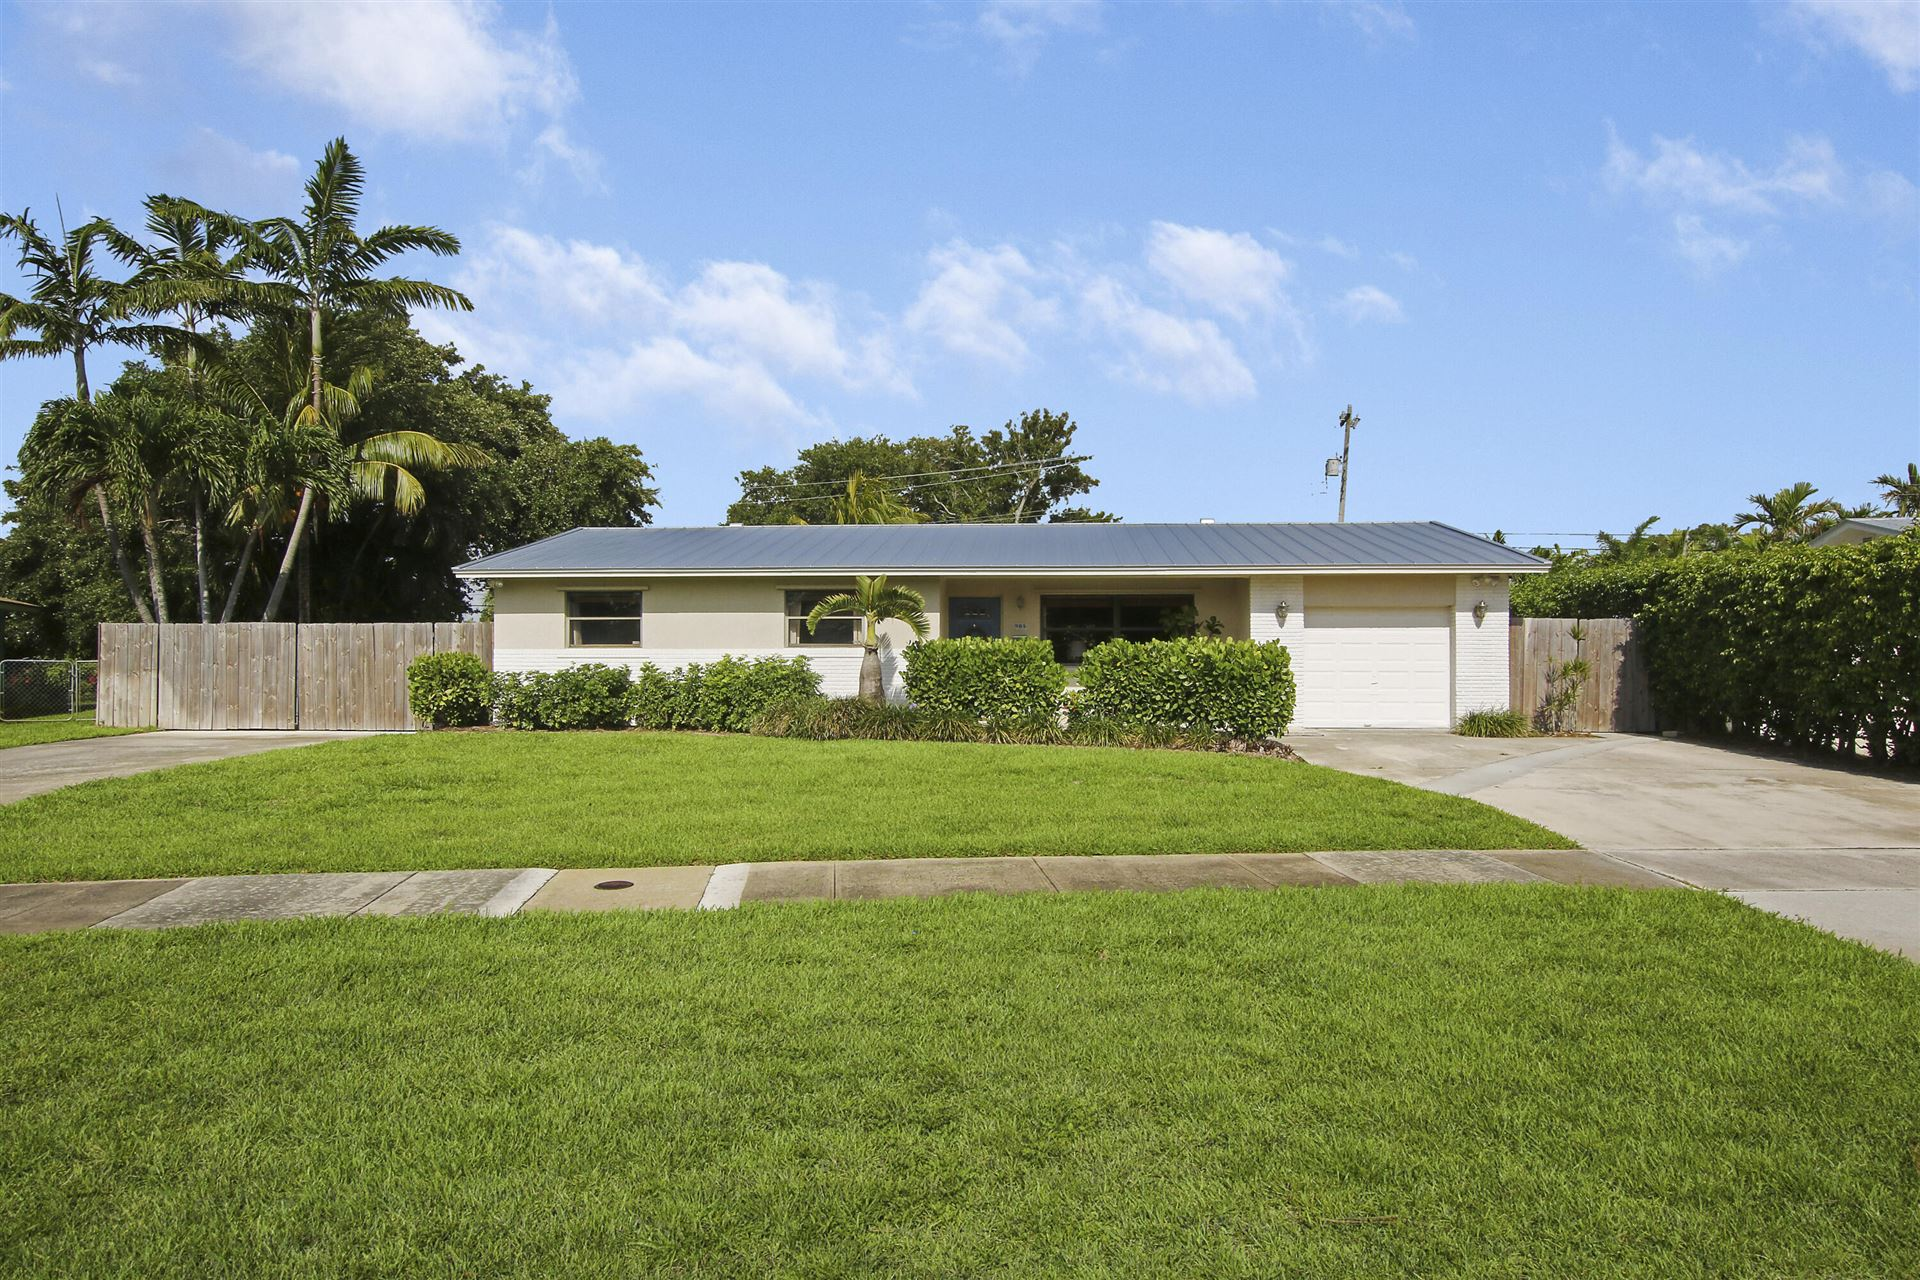 Photo of 985 Laurel Road, North Palm Beach, FL 33408 (MLS # RX-10725054)